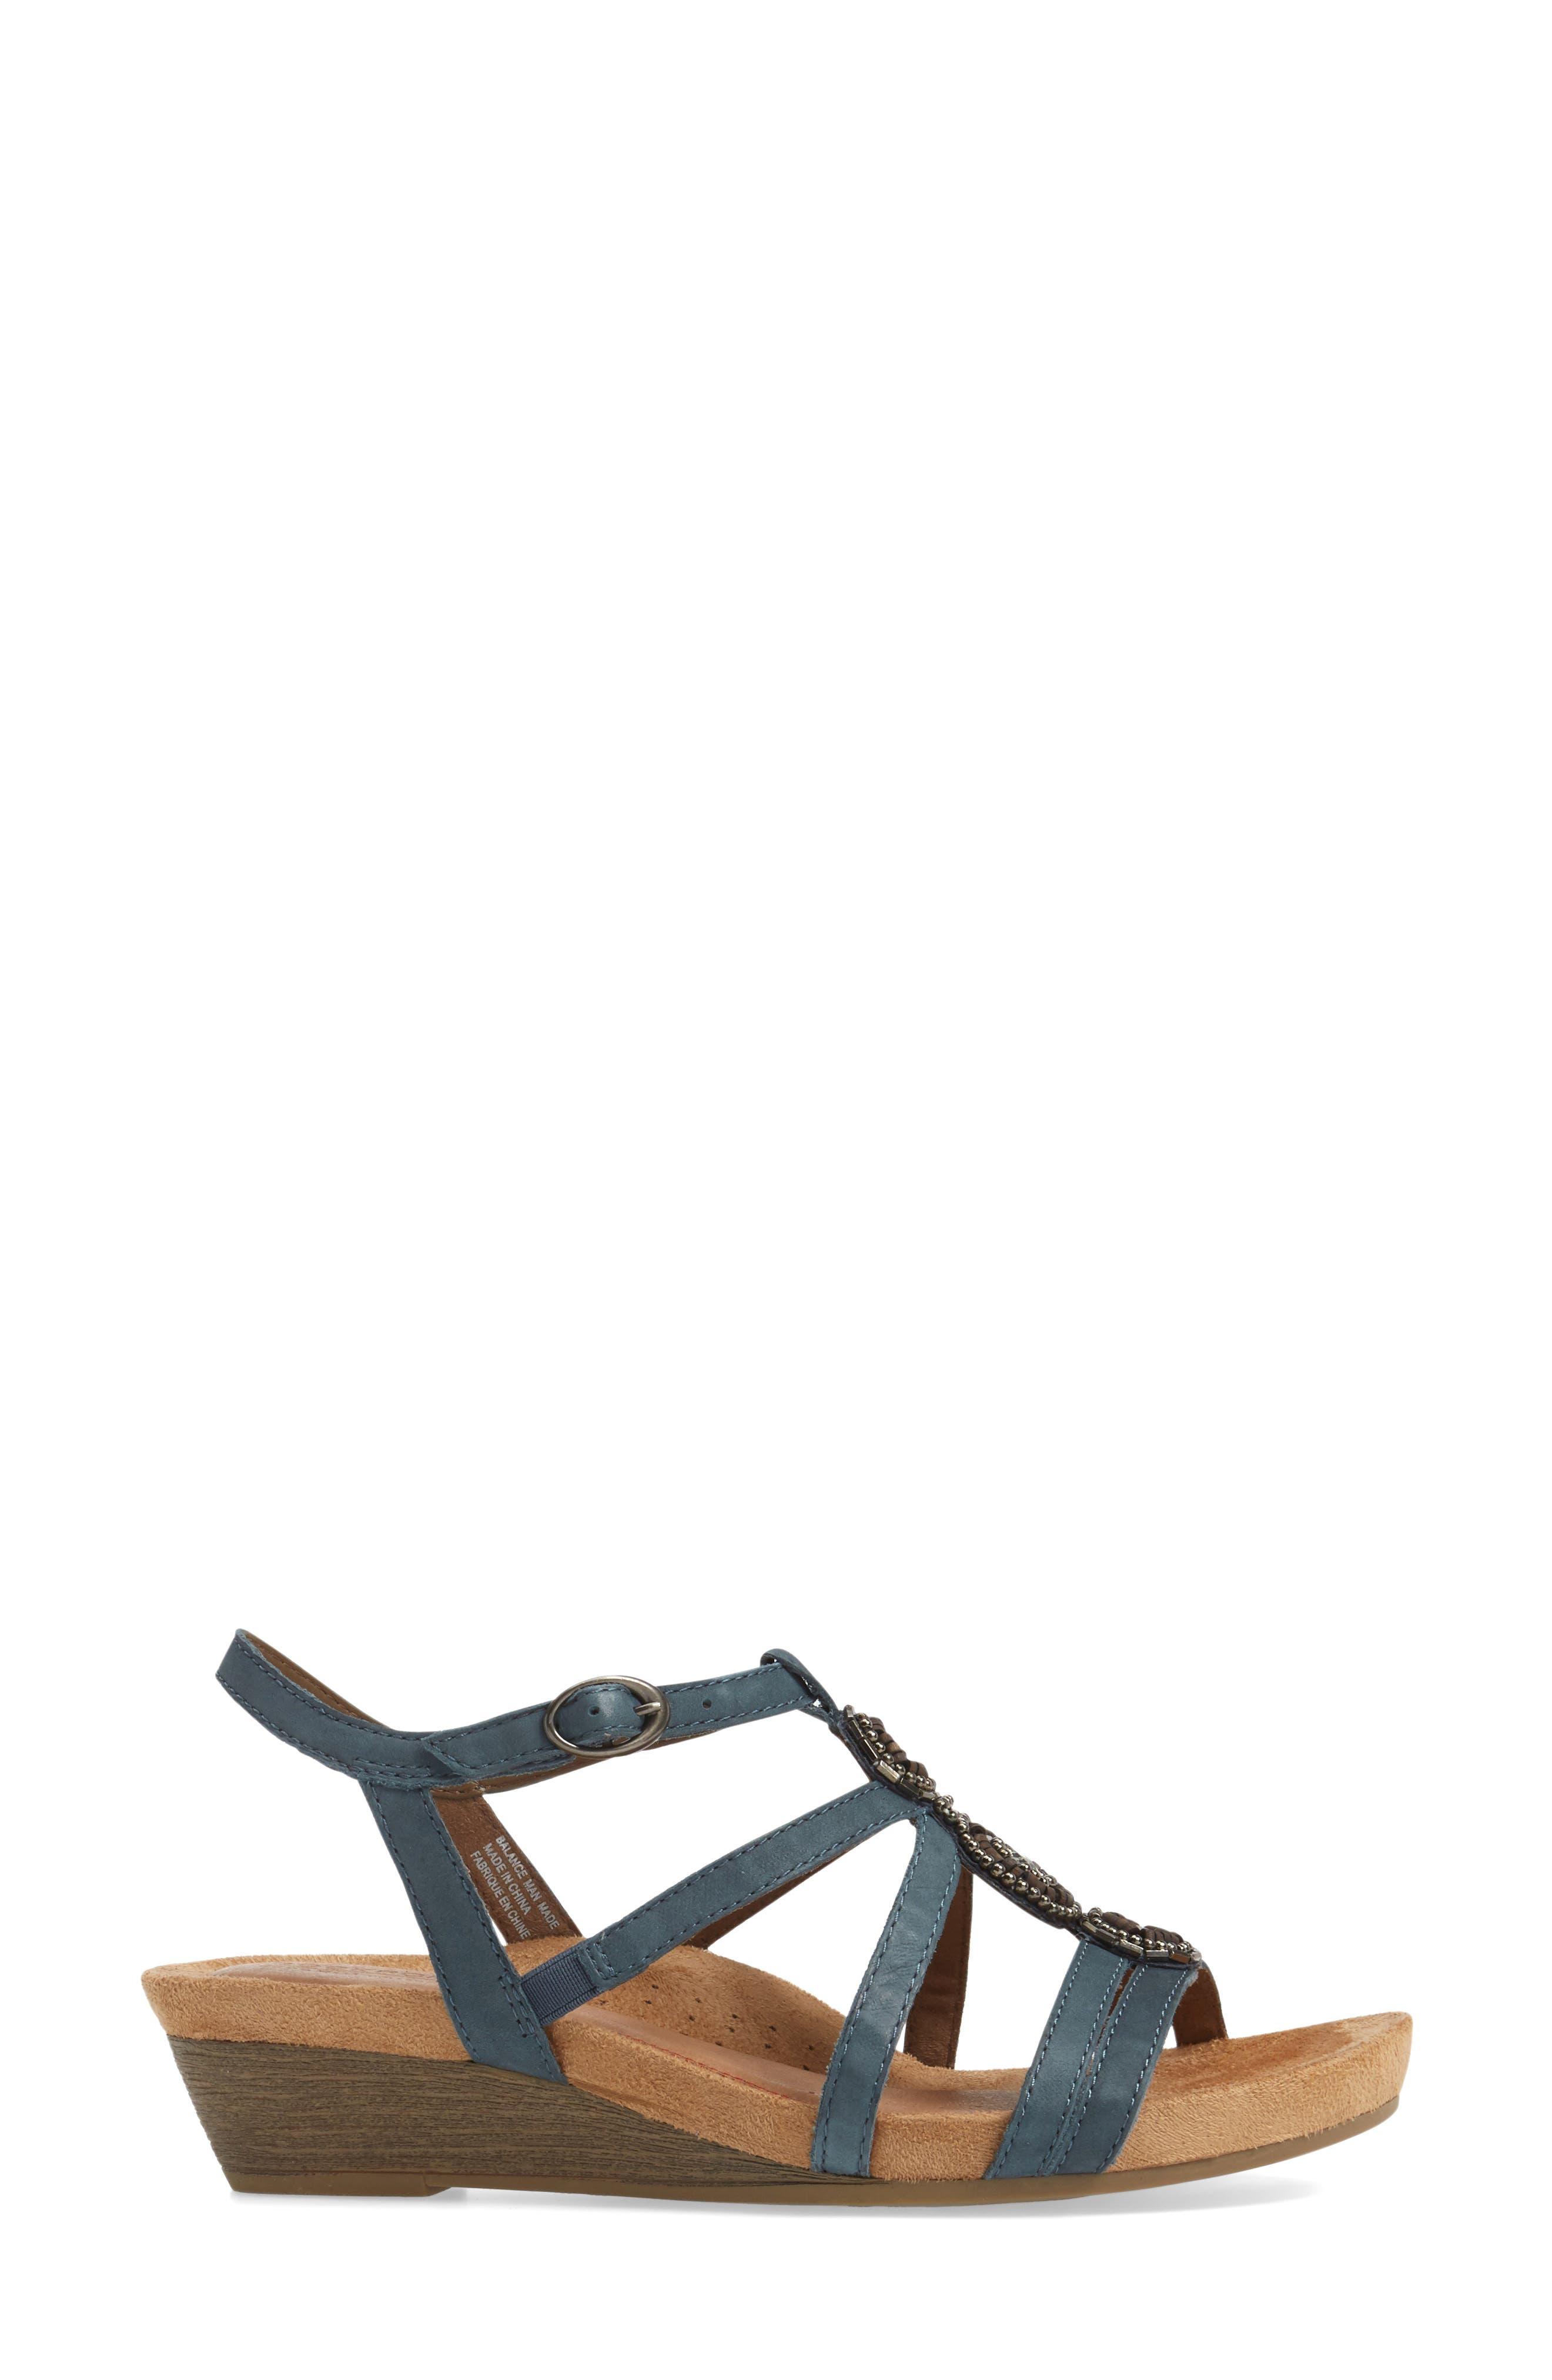 'Hannah' Leather Sandal,                             Alternate thumbnail 3, color,                             BLUE NUBUCK